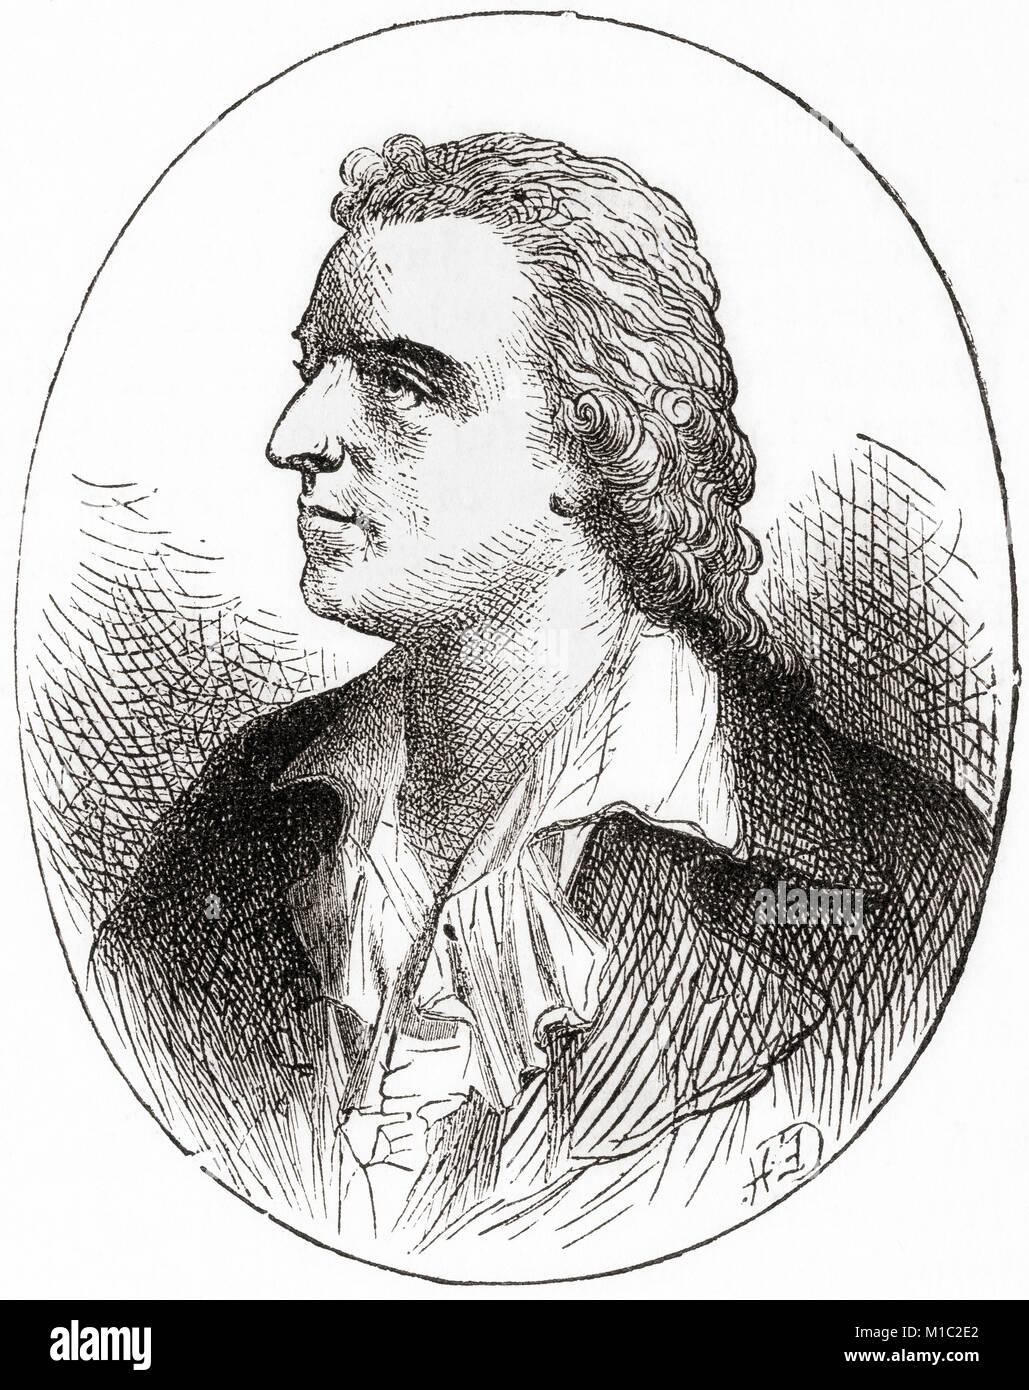 Johann Christoph Friedrich von Schiller, 1759 – 1805.  German poet, philosopher, physician, historian and playwright. - Stock Image